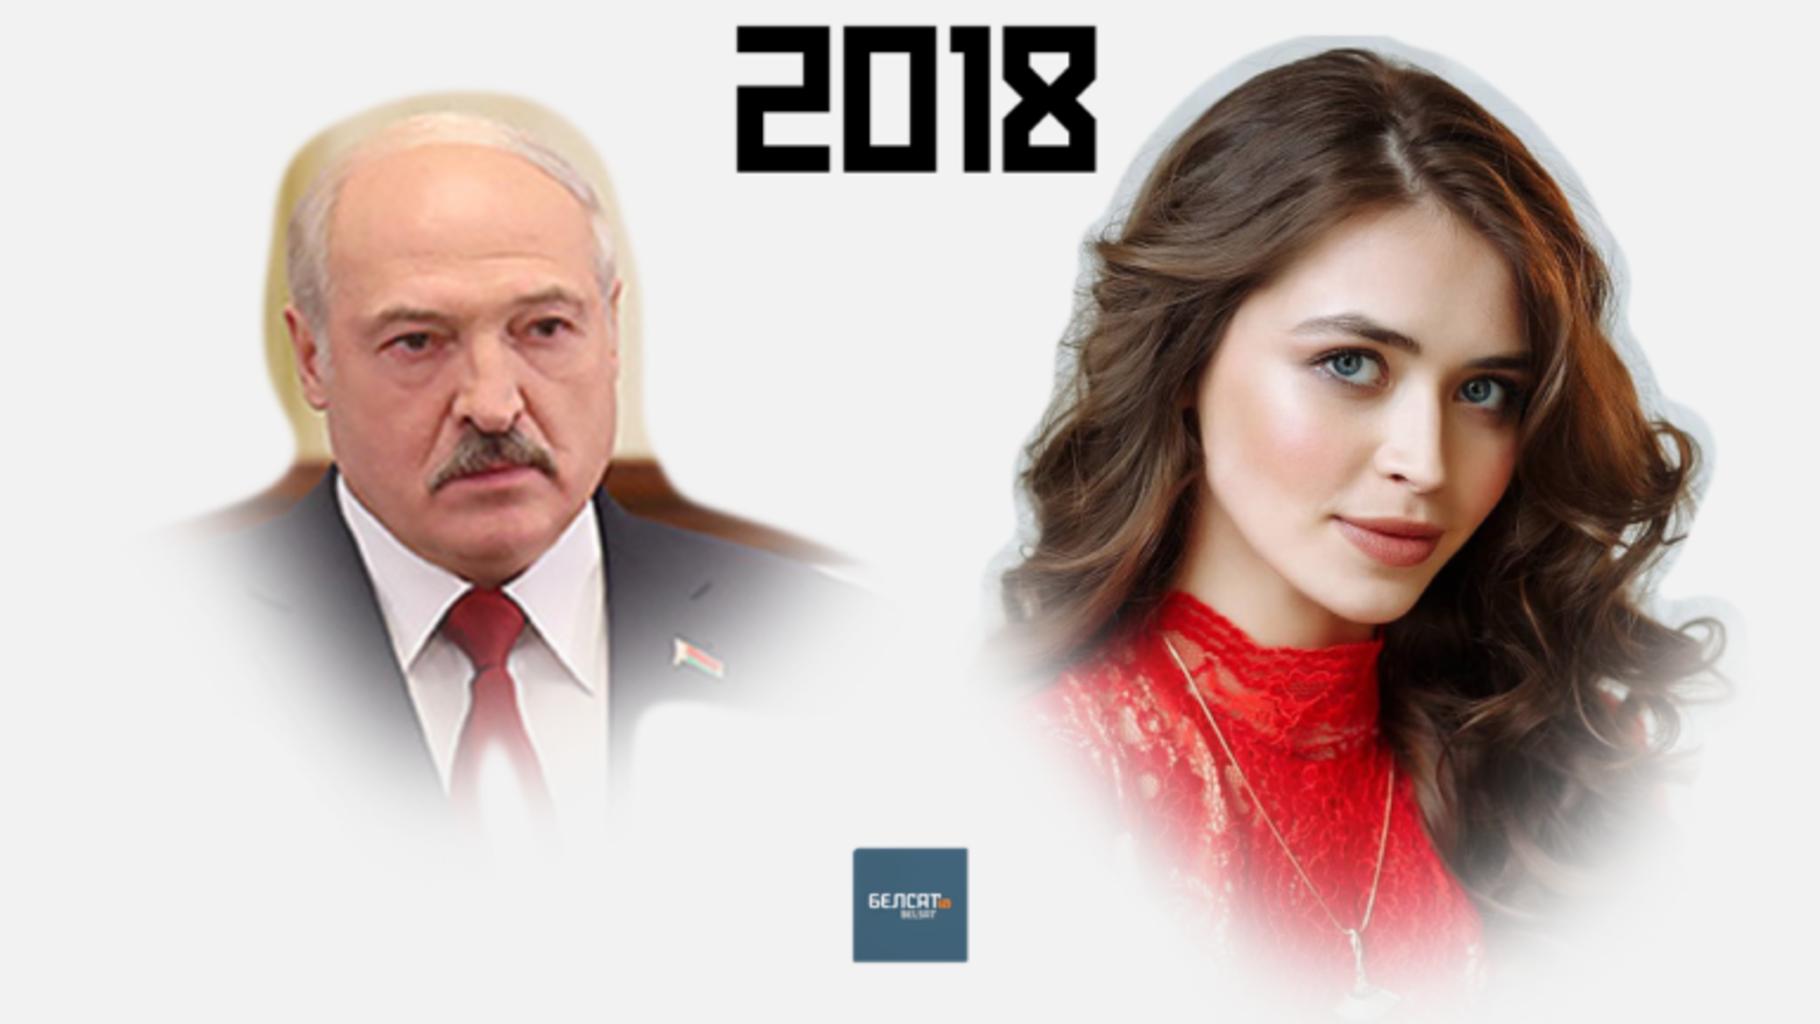 2018 2 768x432